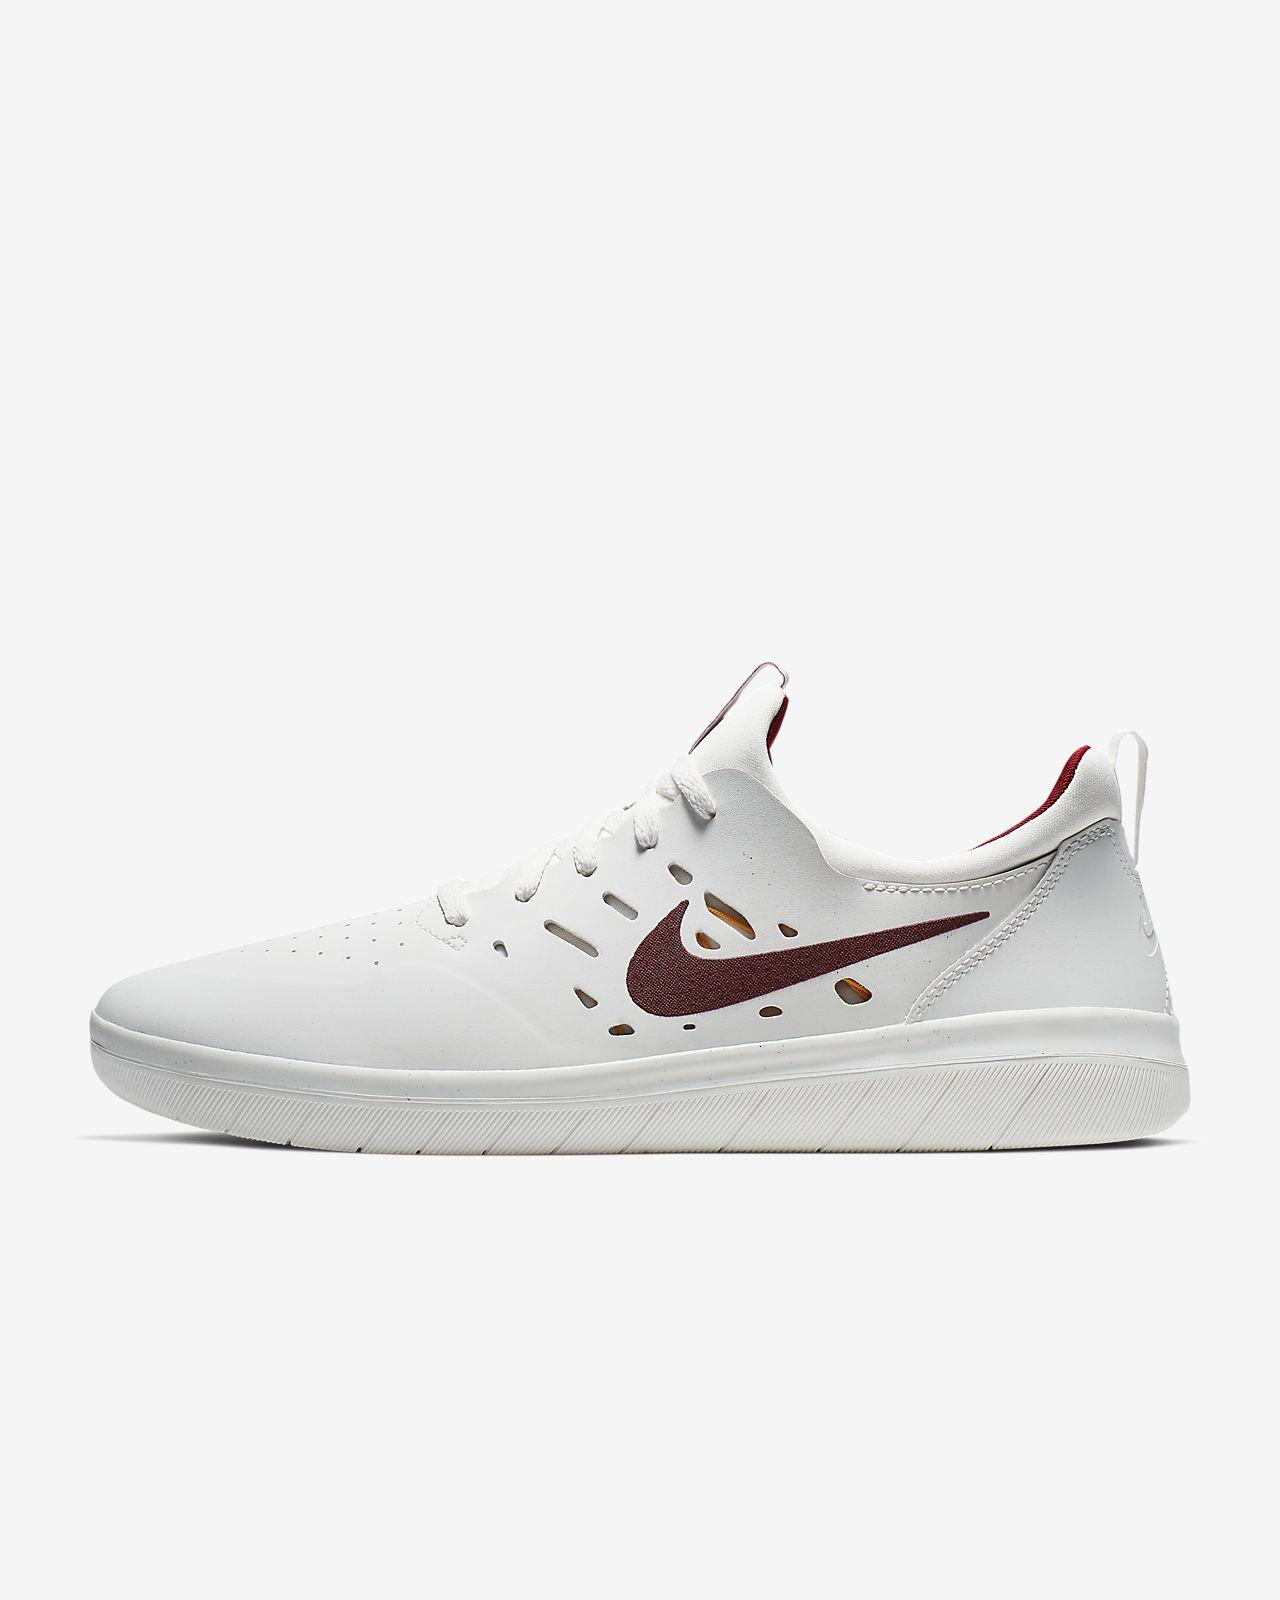 sale retailer 69e92 7d96d ... Nike SB Nyjah Free Skateboardschuh